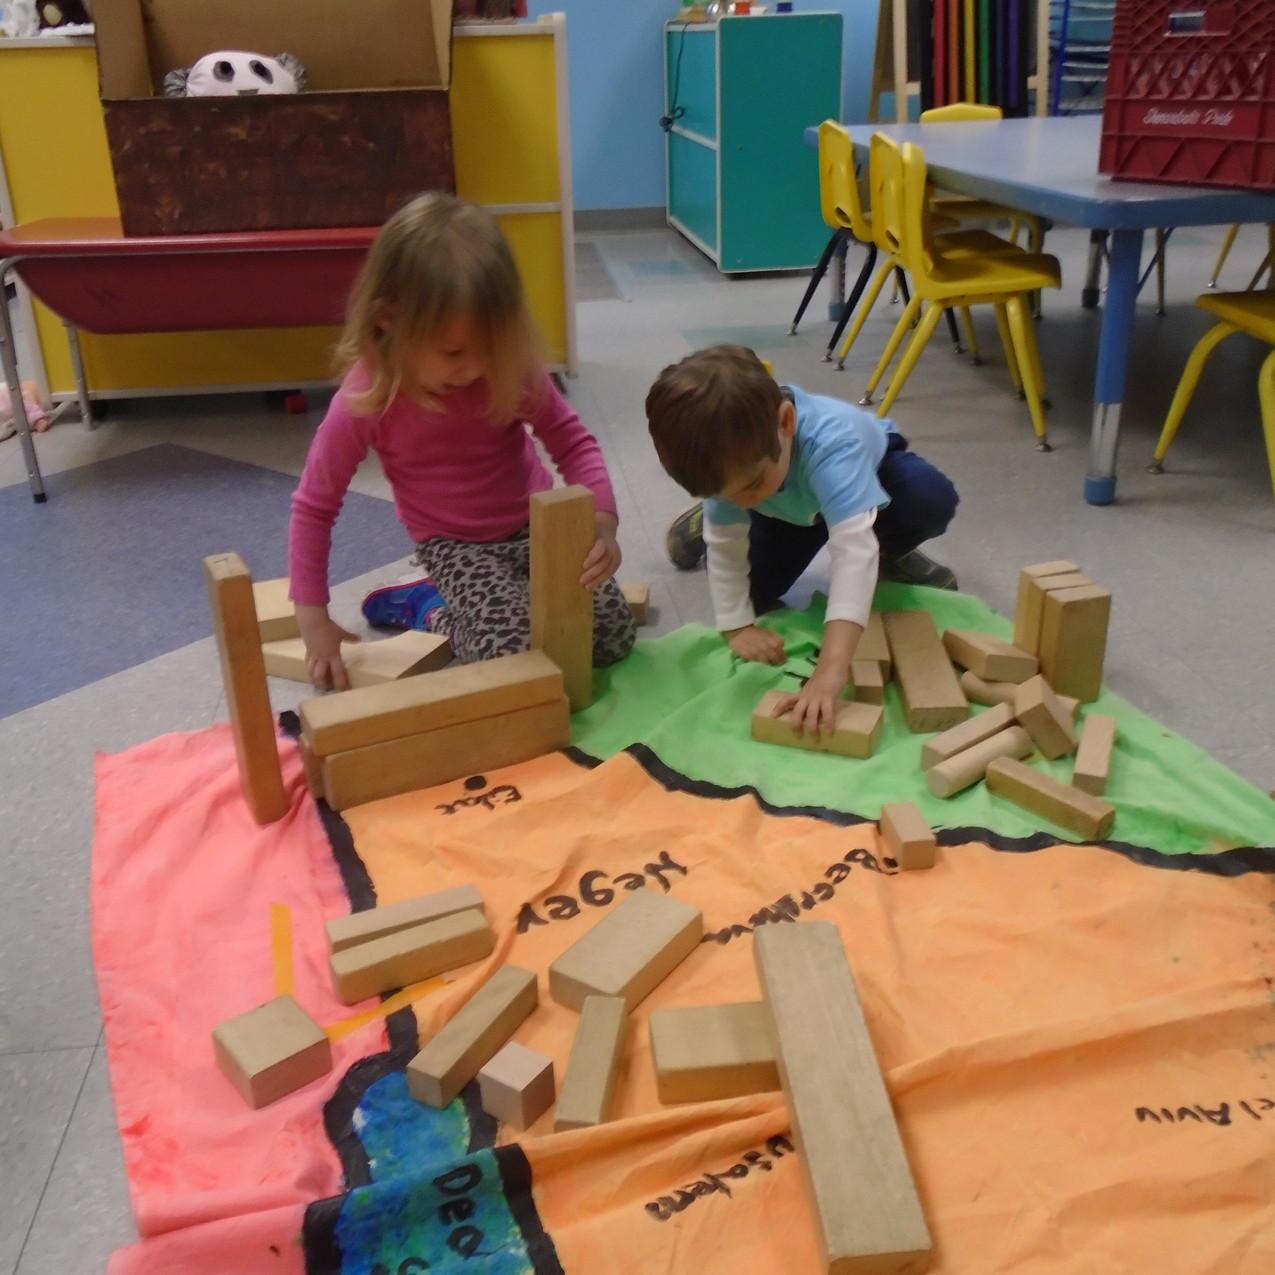 Team Shfanim making pyramids in the Negev.